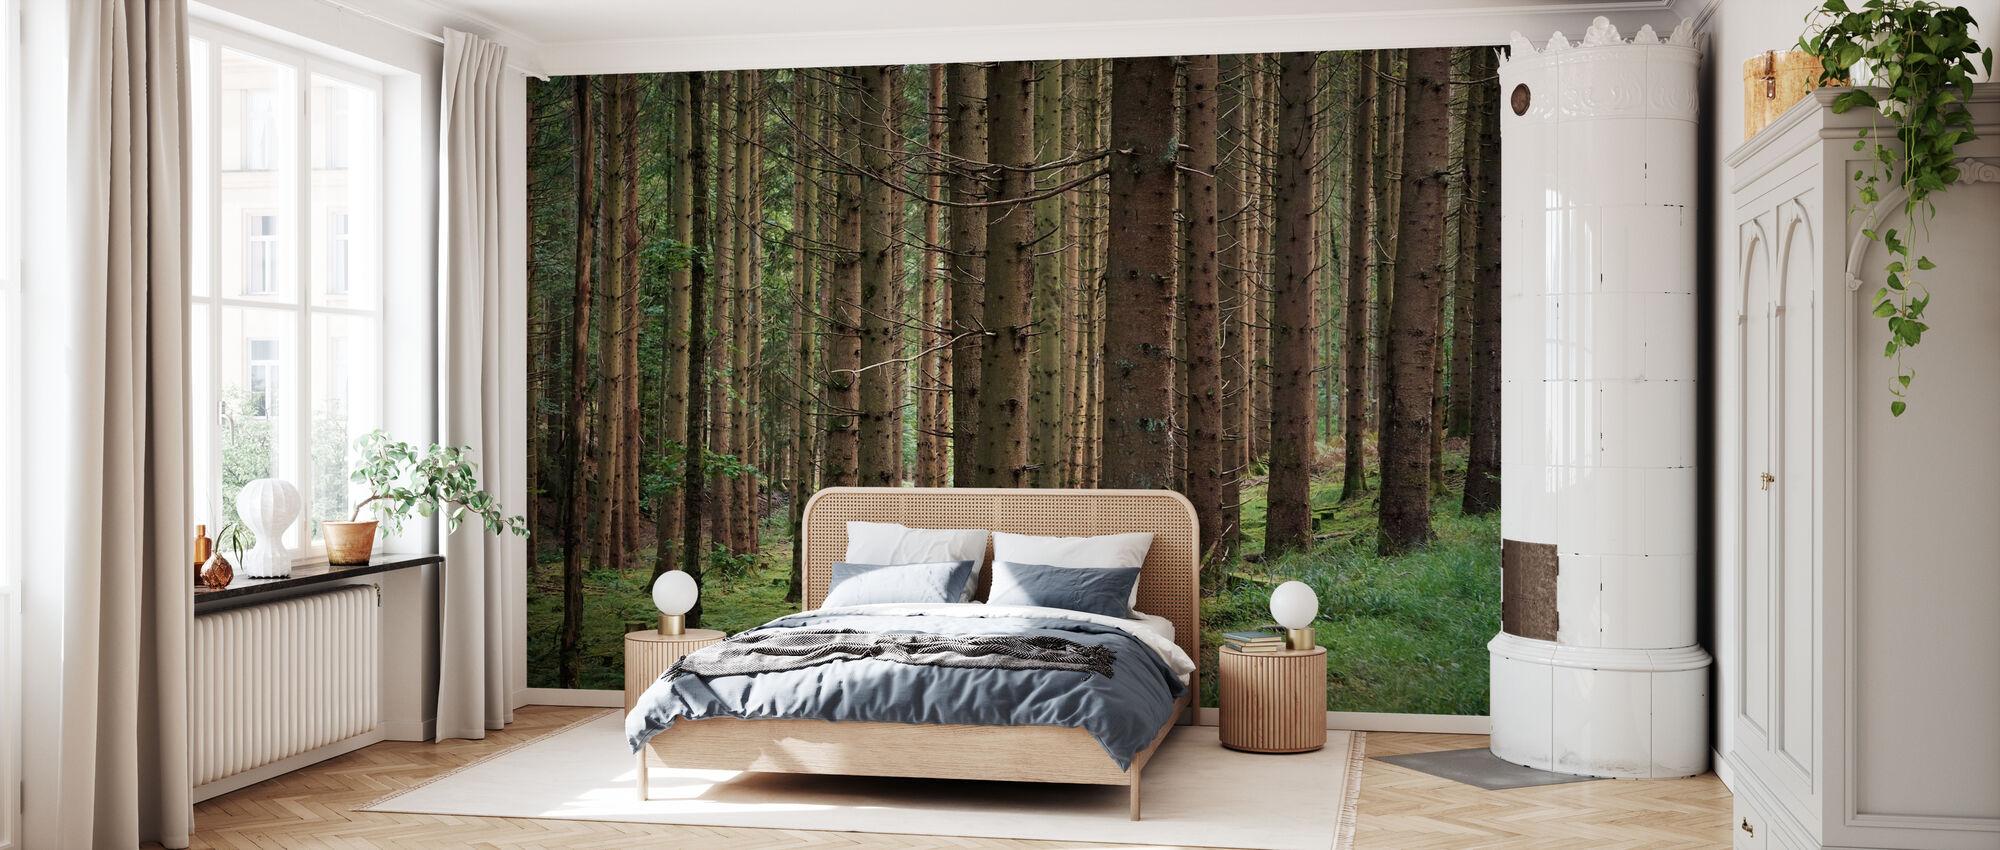 Coniferous Forest - Wallpaper - Bedroom